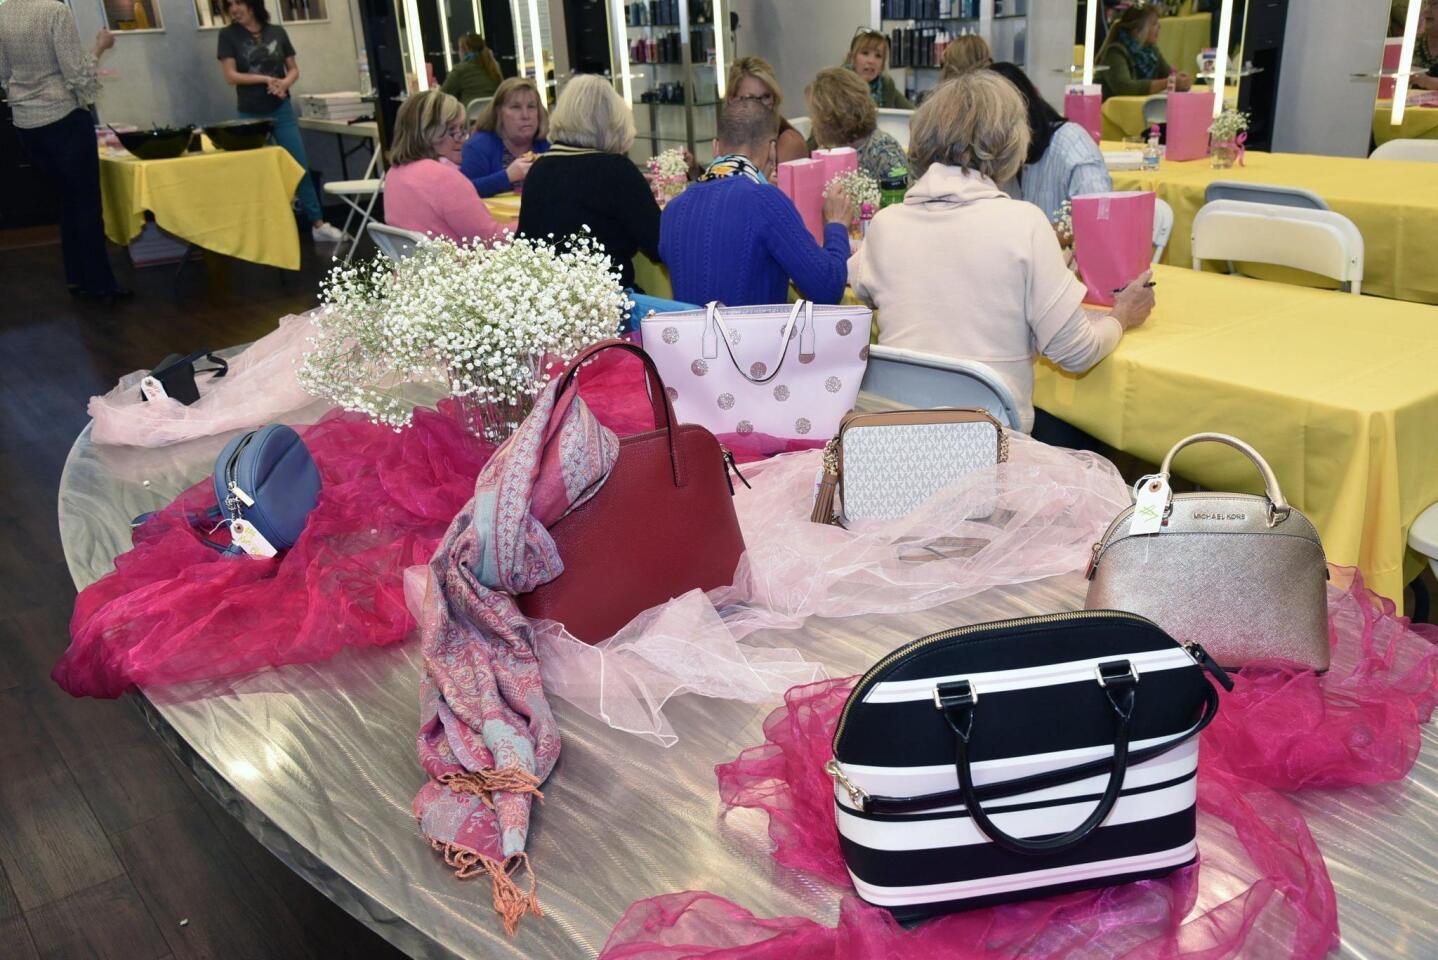 Designer handbags were the prizes for the evening